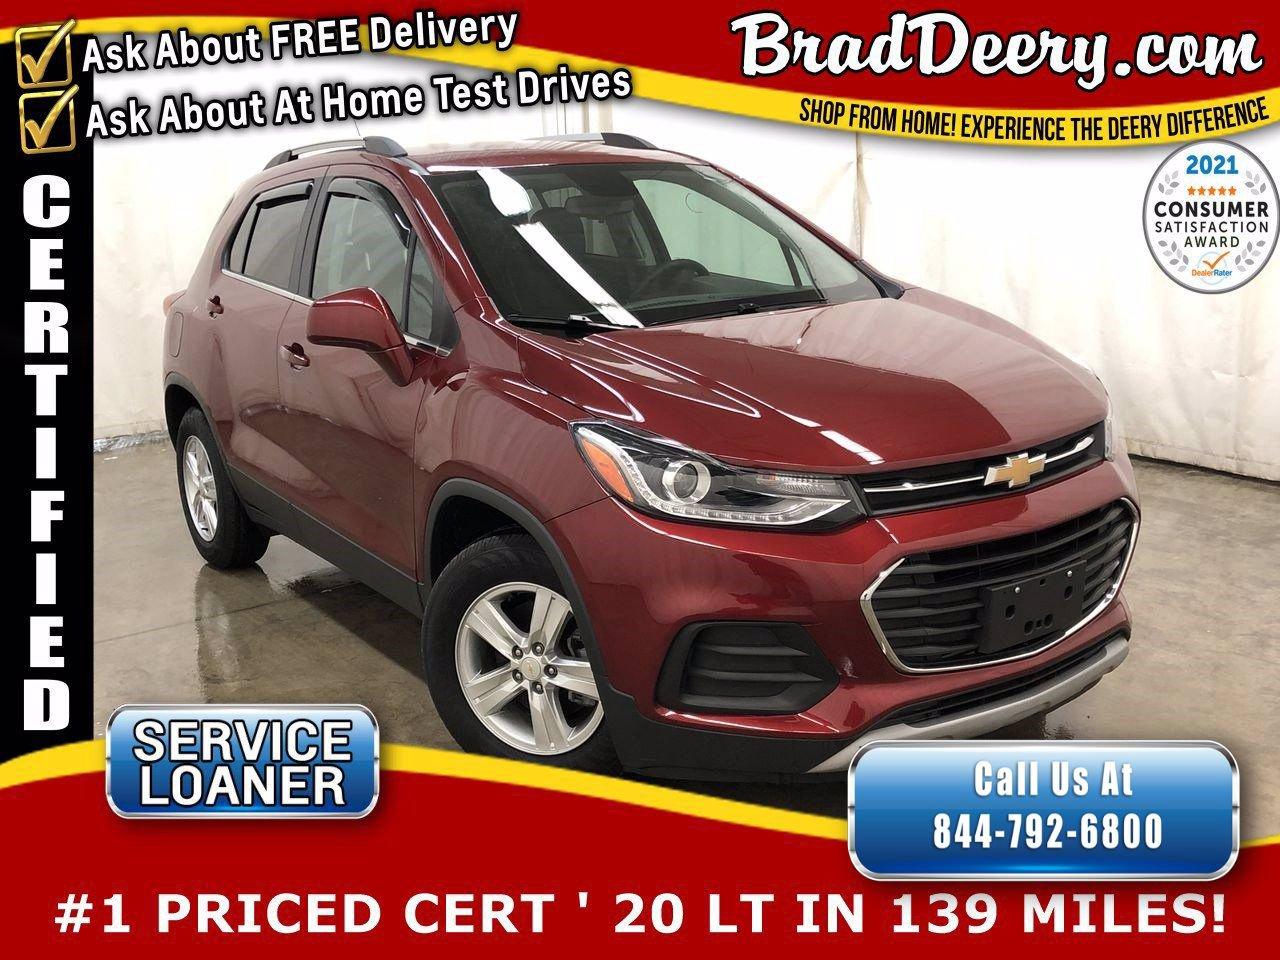 2020 Chevrolet Trax LT ** GM CERTIFIED ** w/ Clean Carfax, Remote Start, Back-Up Camera, Keyless Open & Start